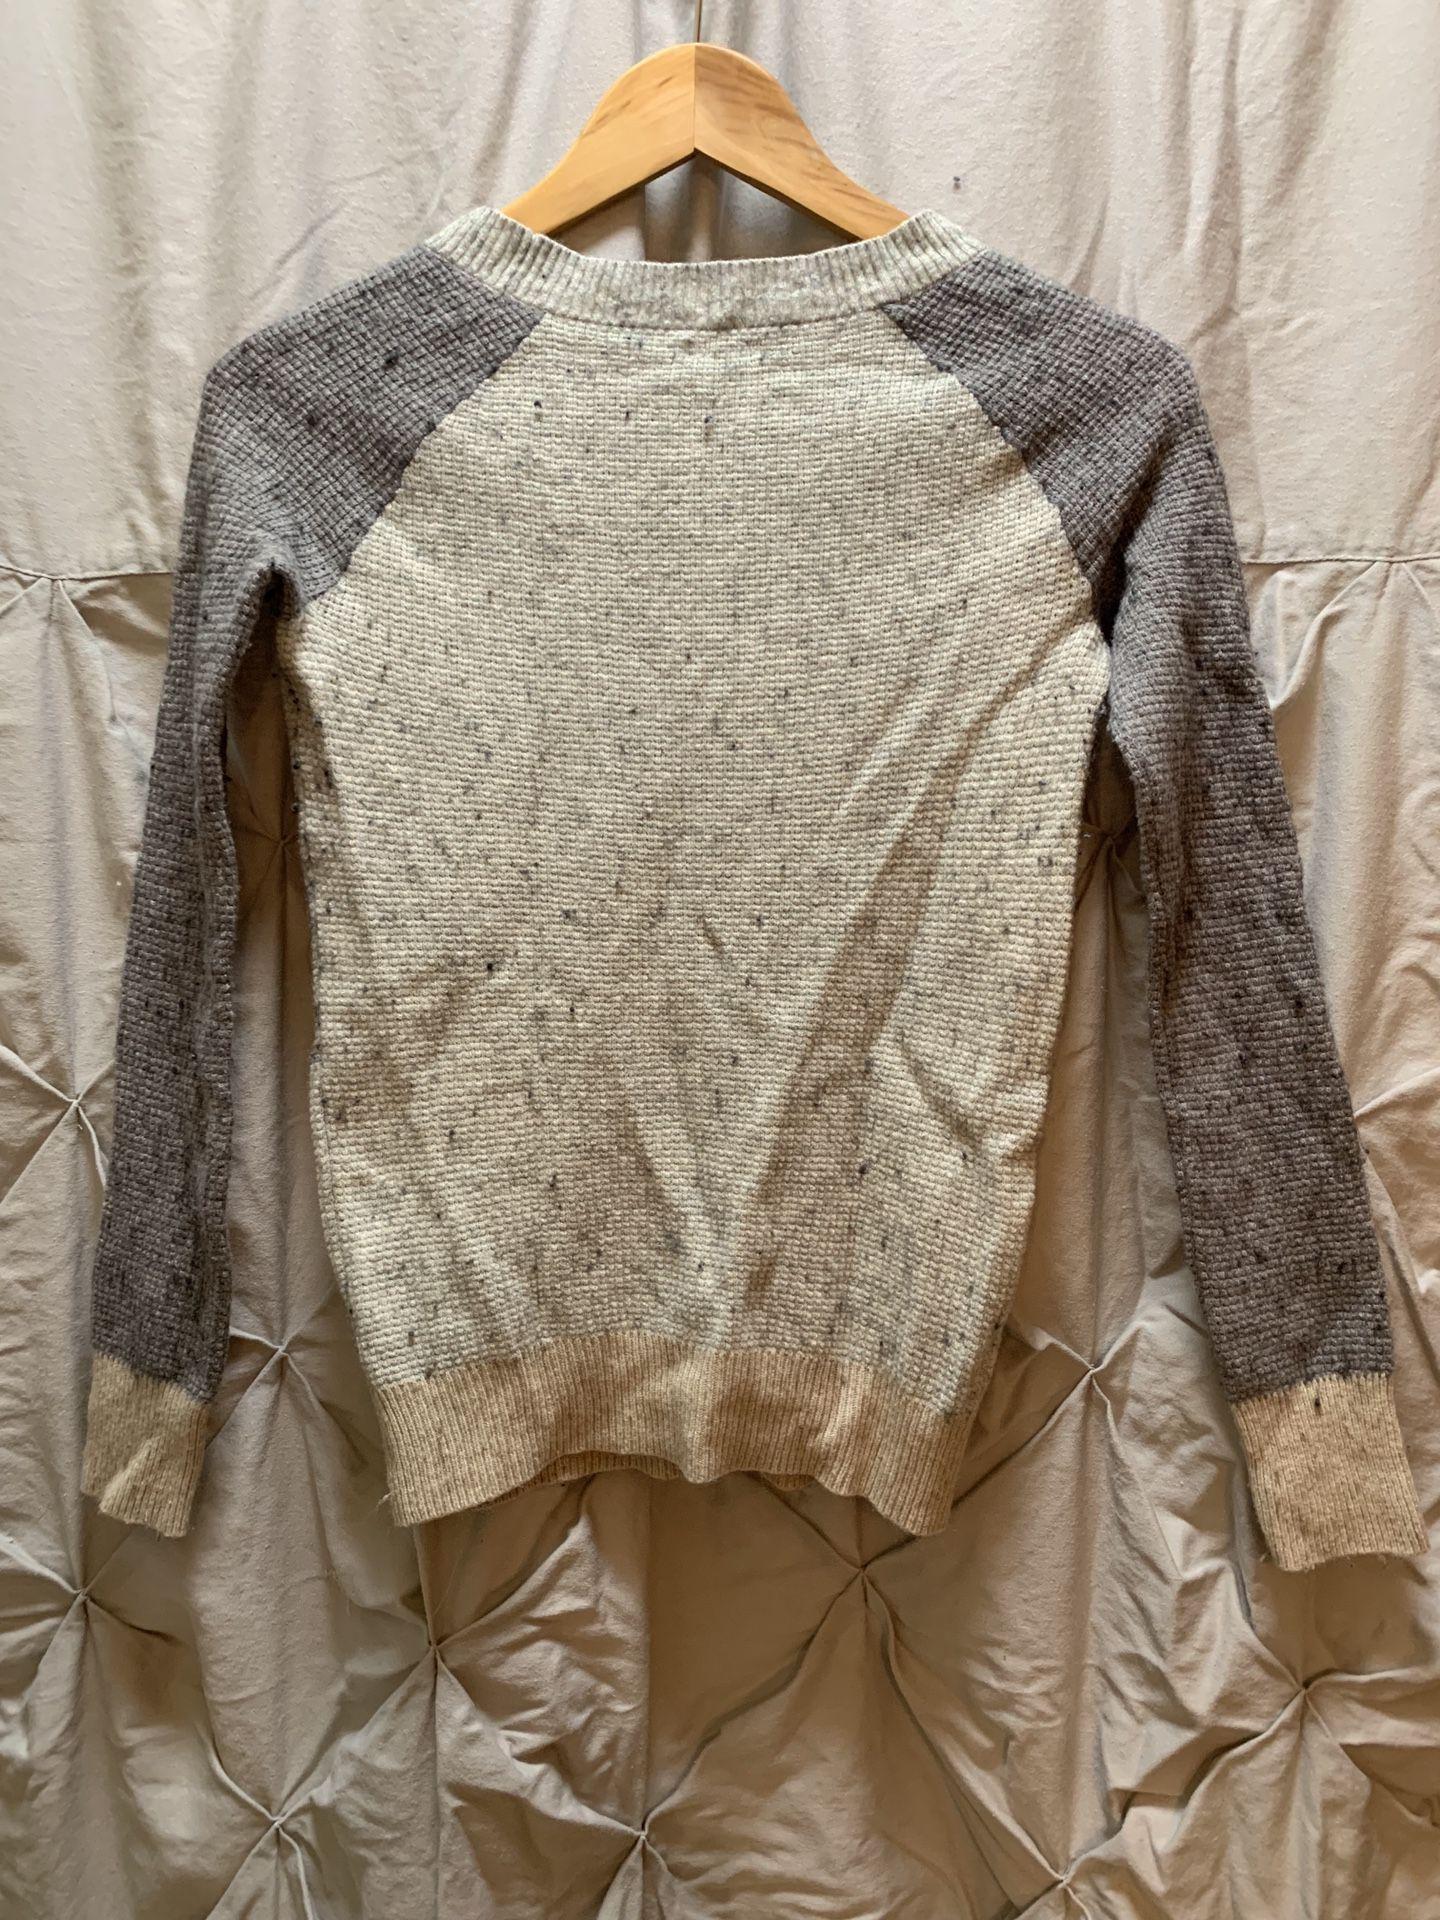 Women's J Crew sweater size: xs